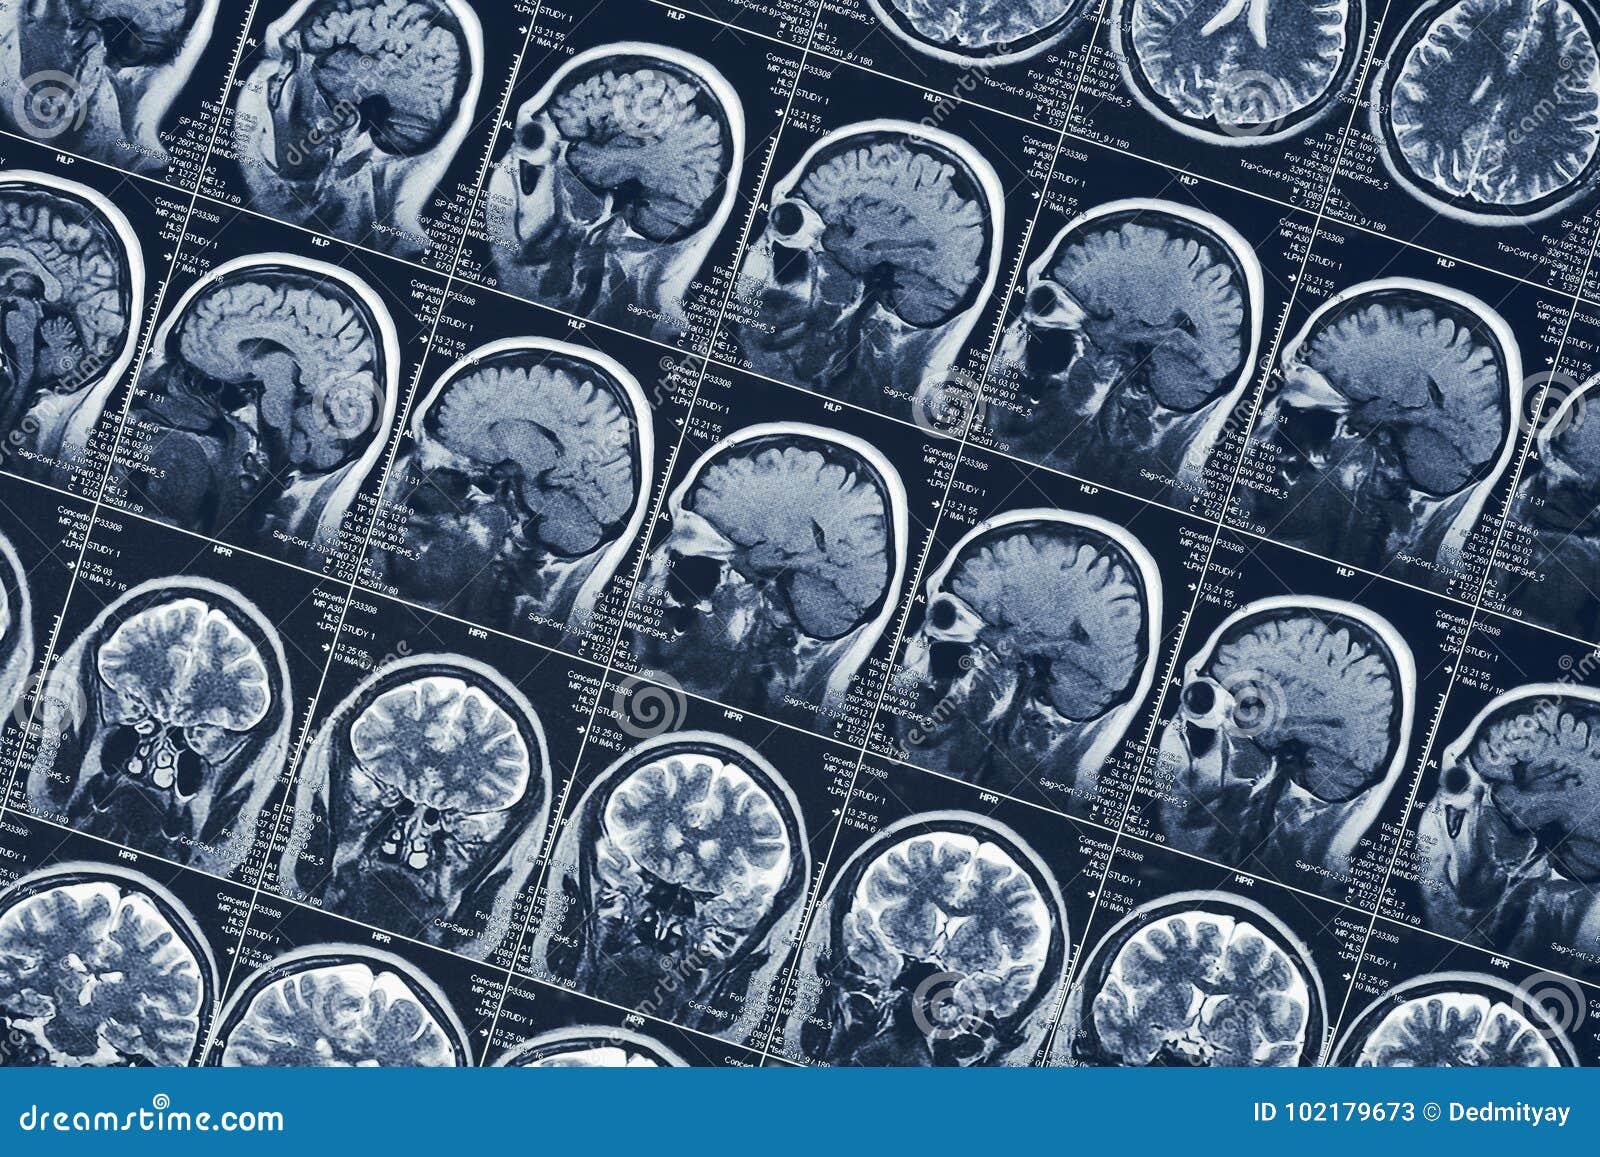 MRI脑部扫描或X-射线神经学人头头骨X线体层照相术测试